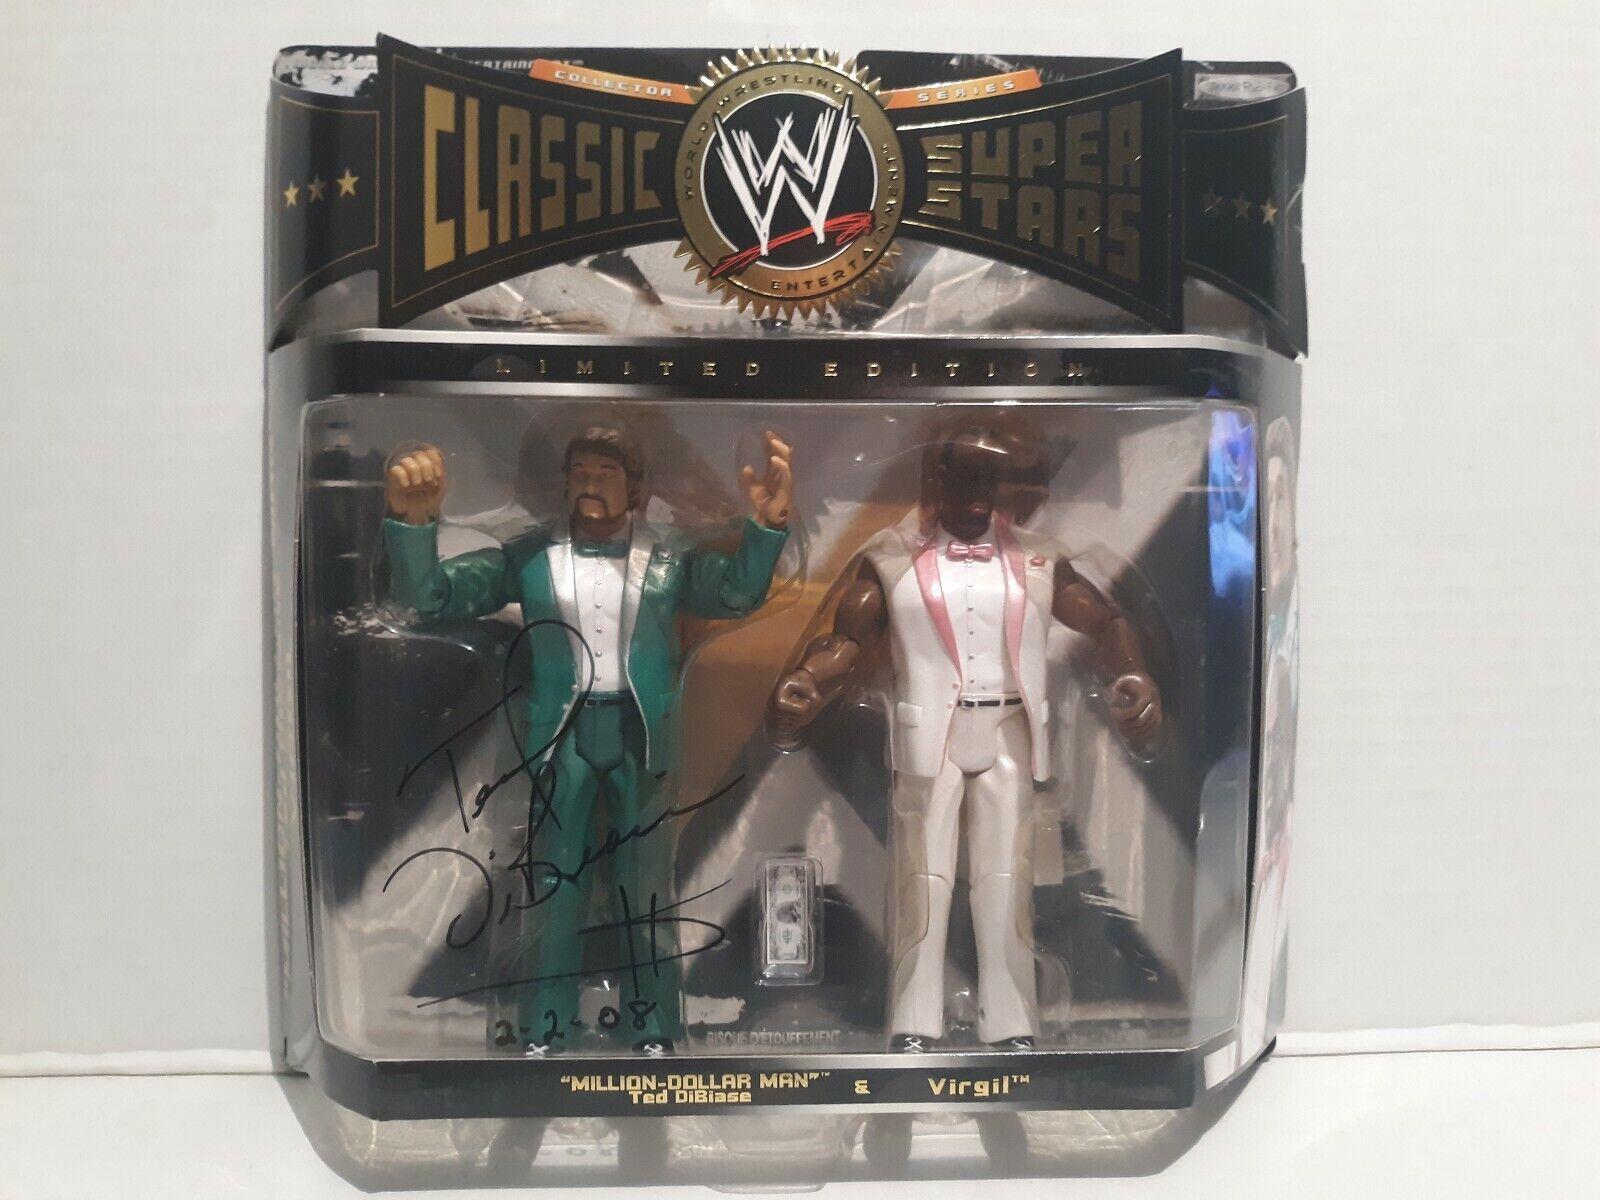 Wwe Classic súperEstrellas Autografiado Million Dollar Man Ted DiBiase & Virgil